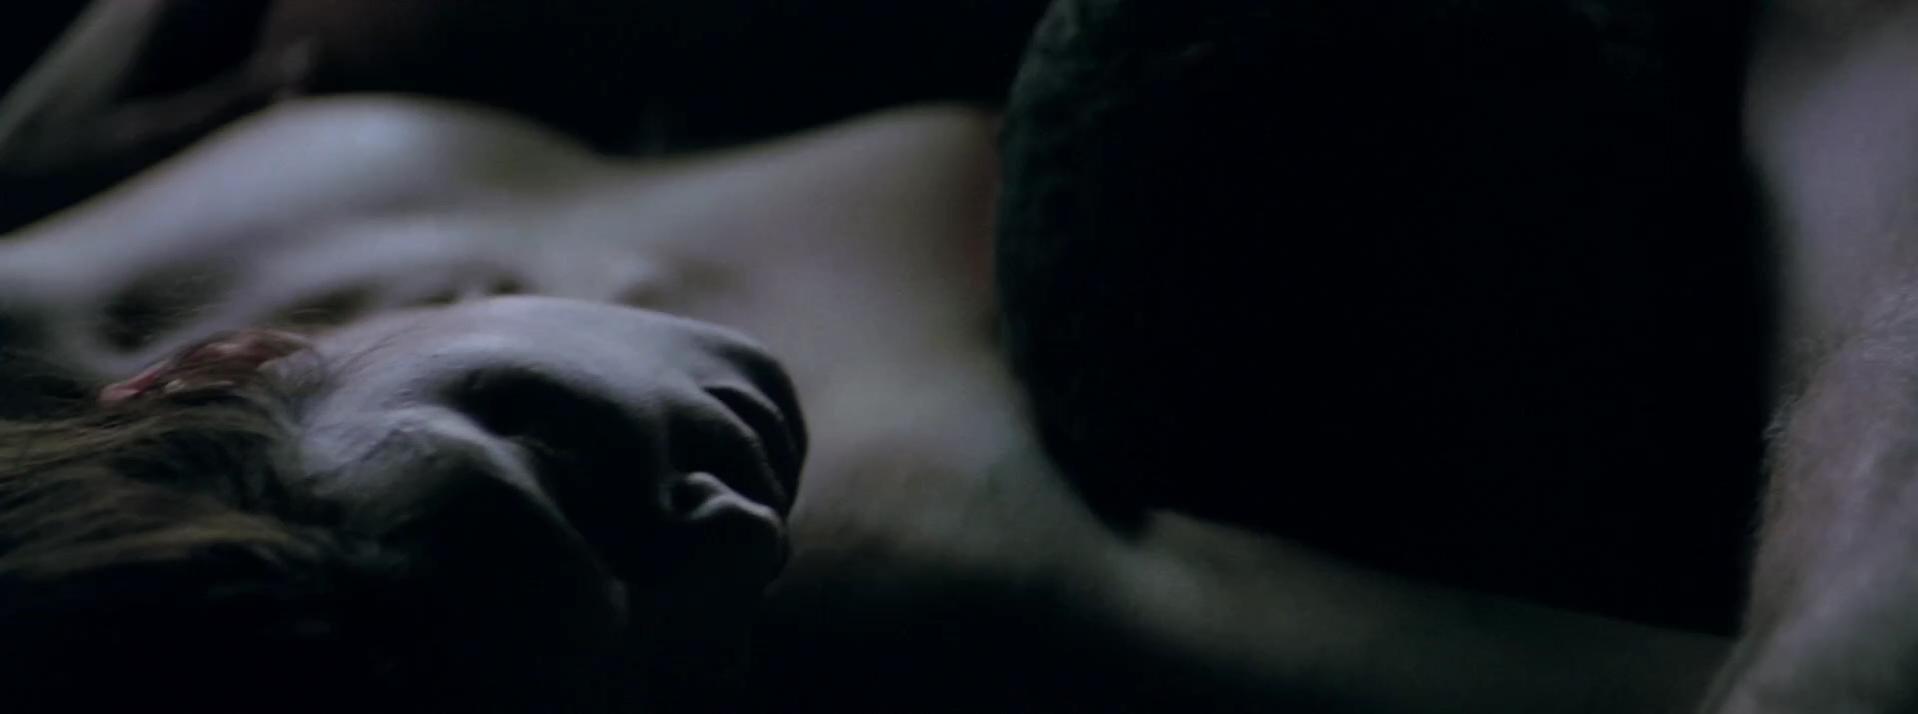 nude Ass Jeanne Tripplehorn (55 fotos) Leaked, iCloud, see through